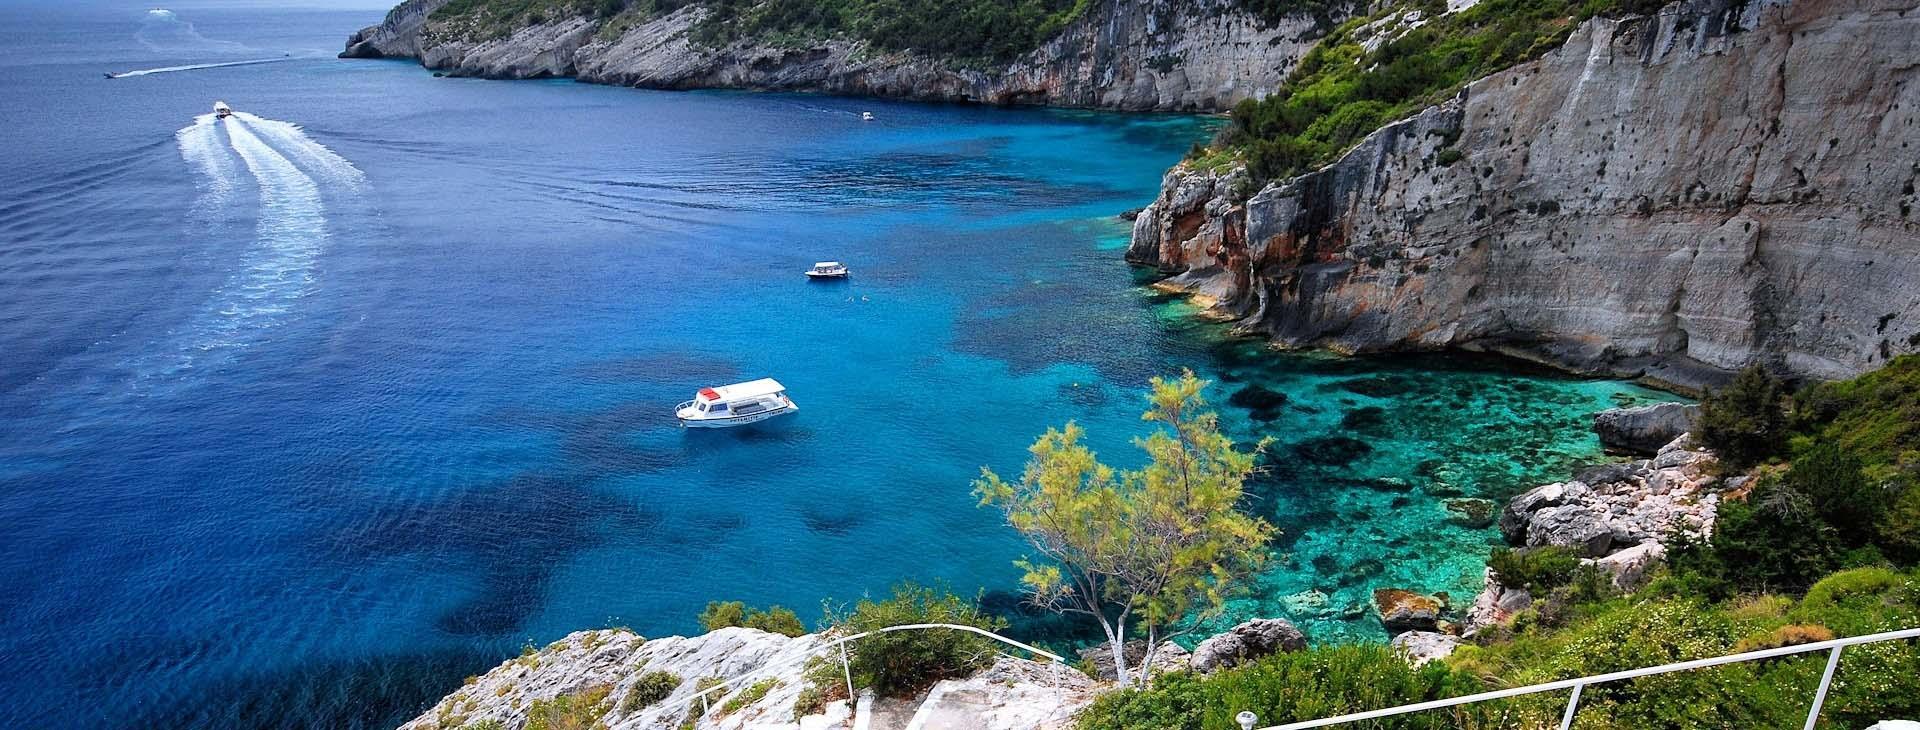 Cove at Zakynthos island